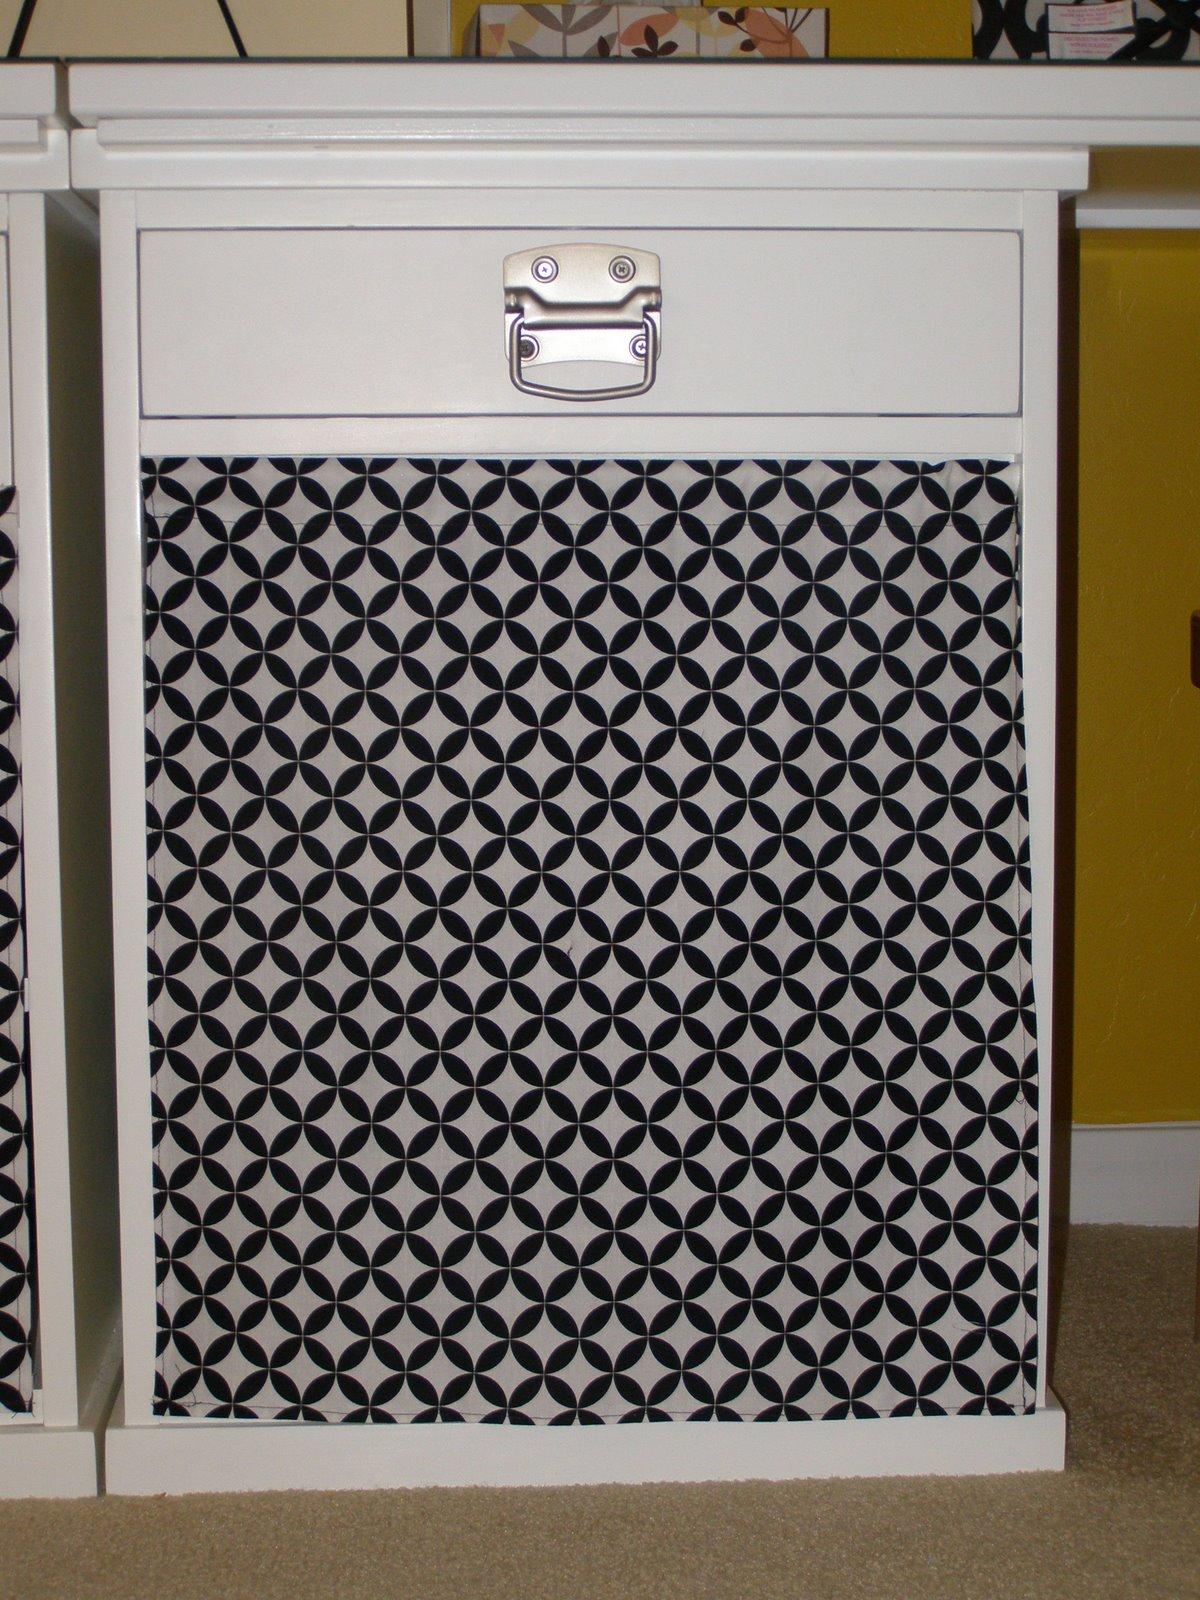 armario decorado con tela